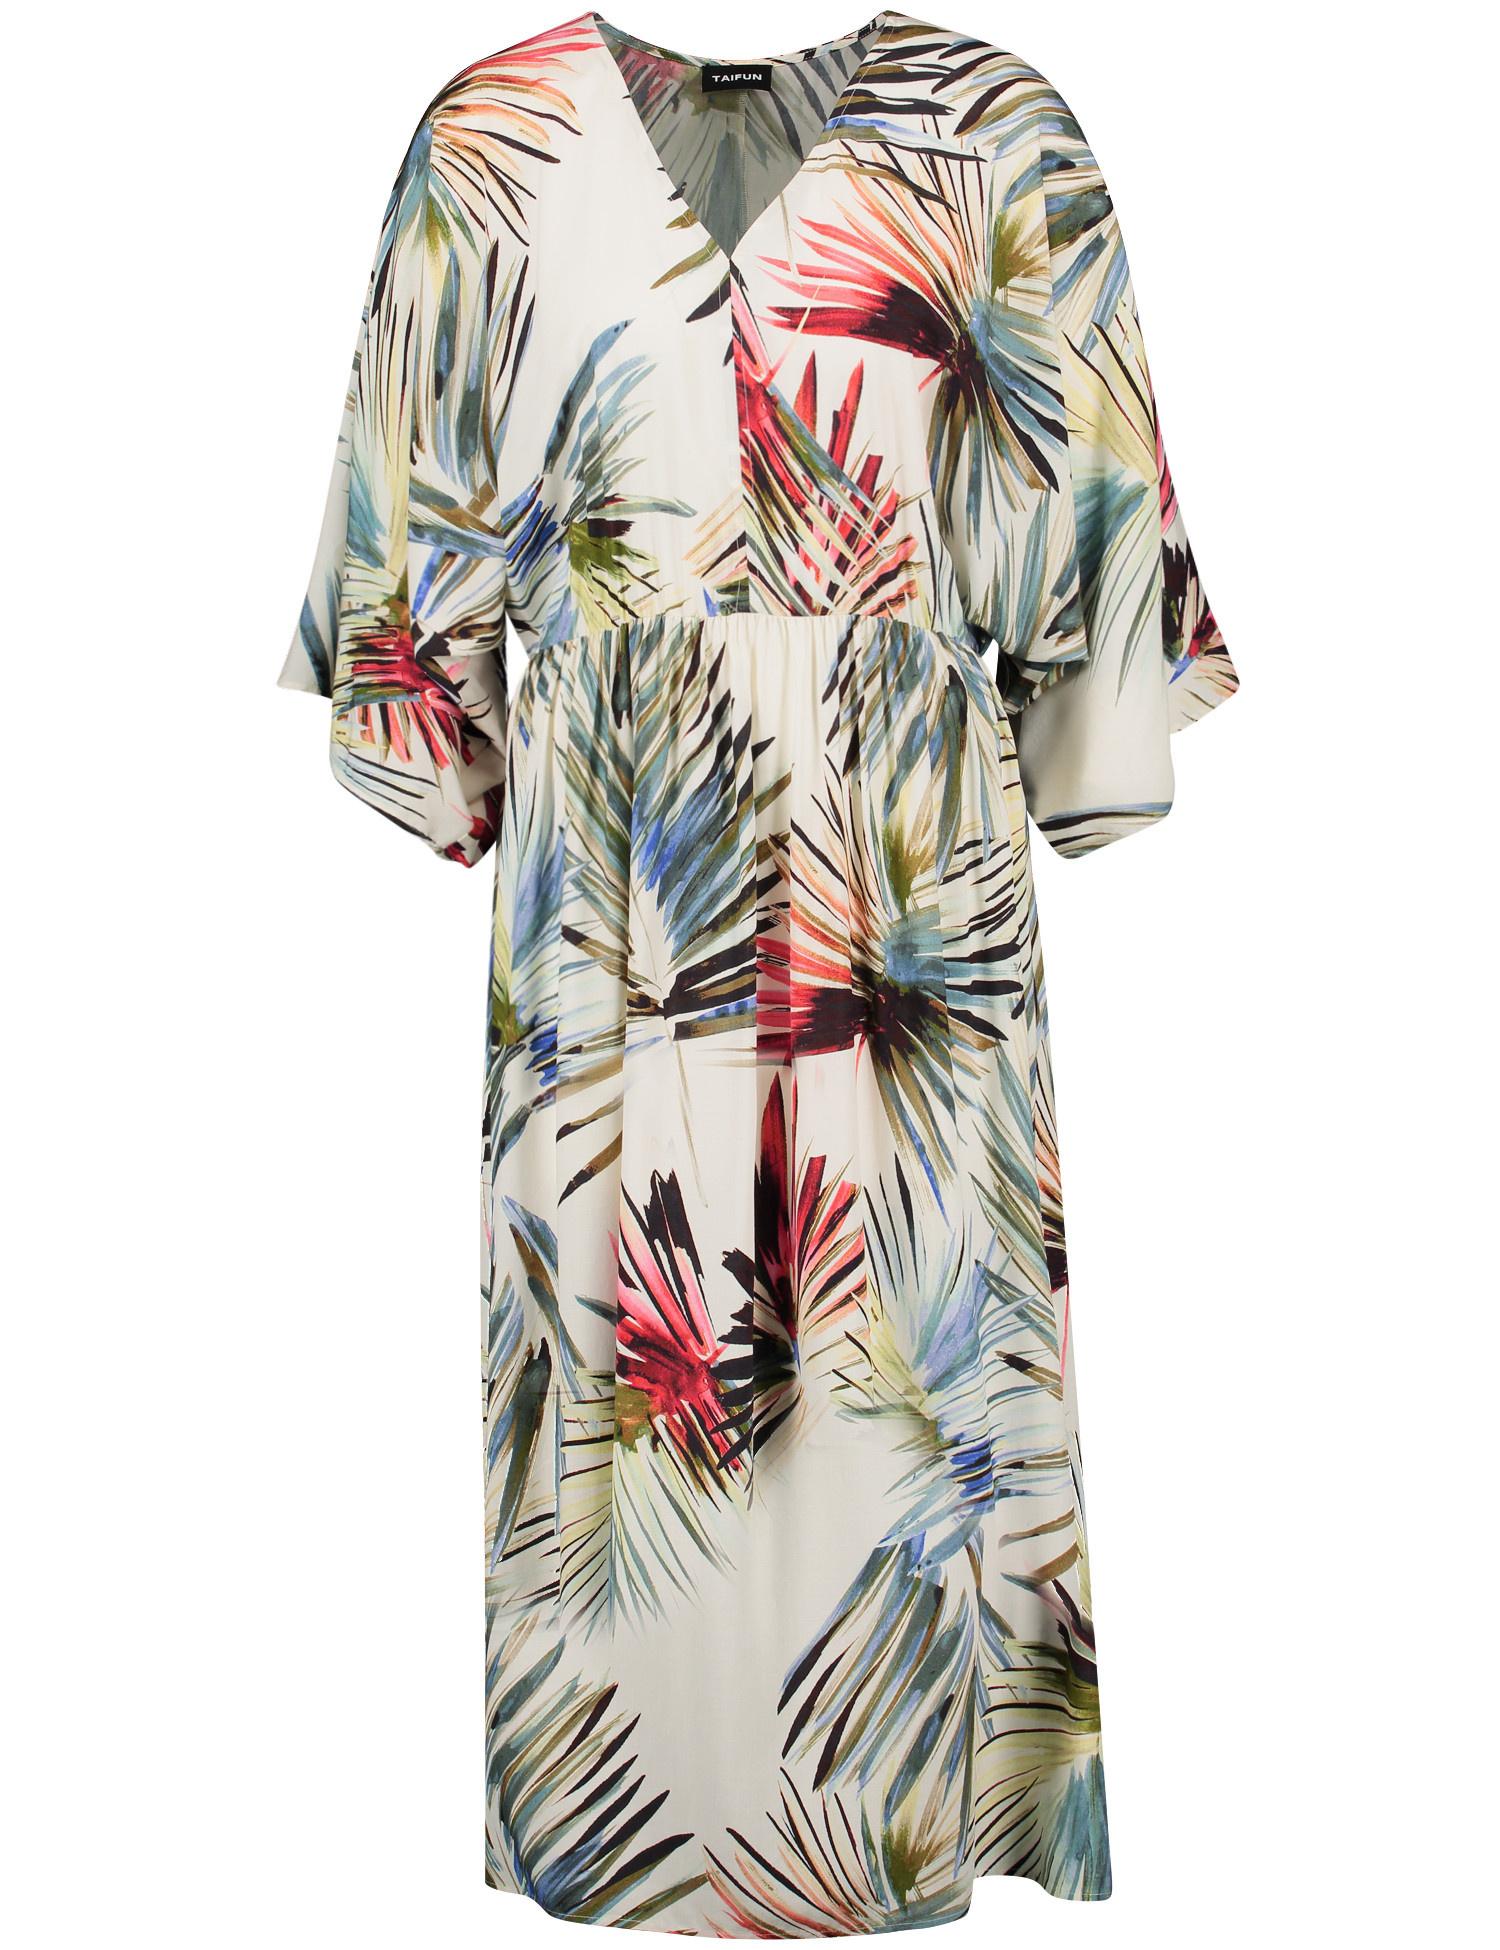 TAIFUN robe longue imprimé-1